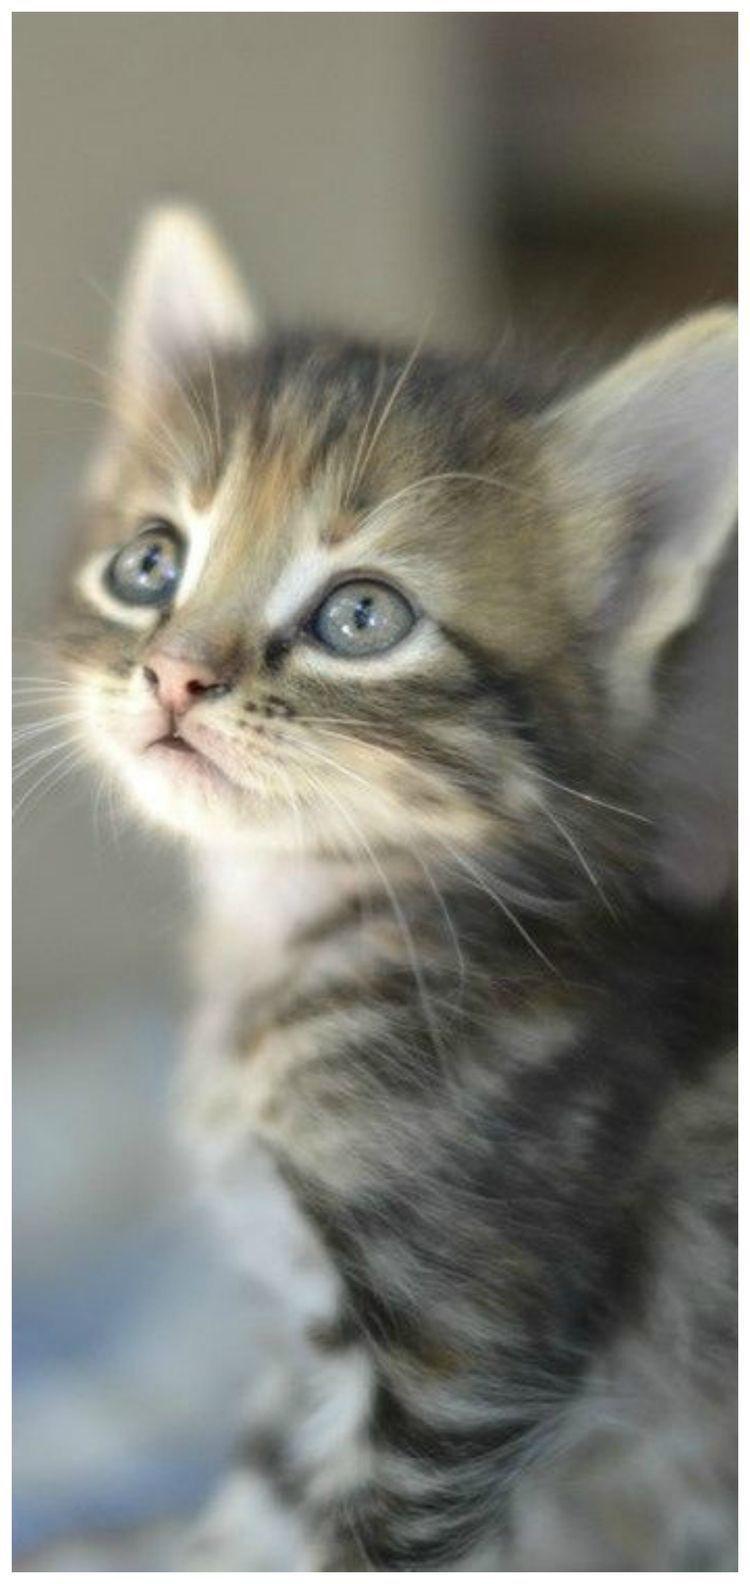 Pin By Carrie Burdine On Animals Kitten Adoption Kittens Cutest